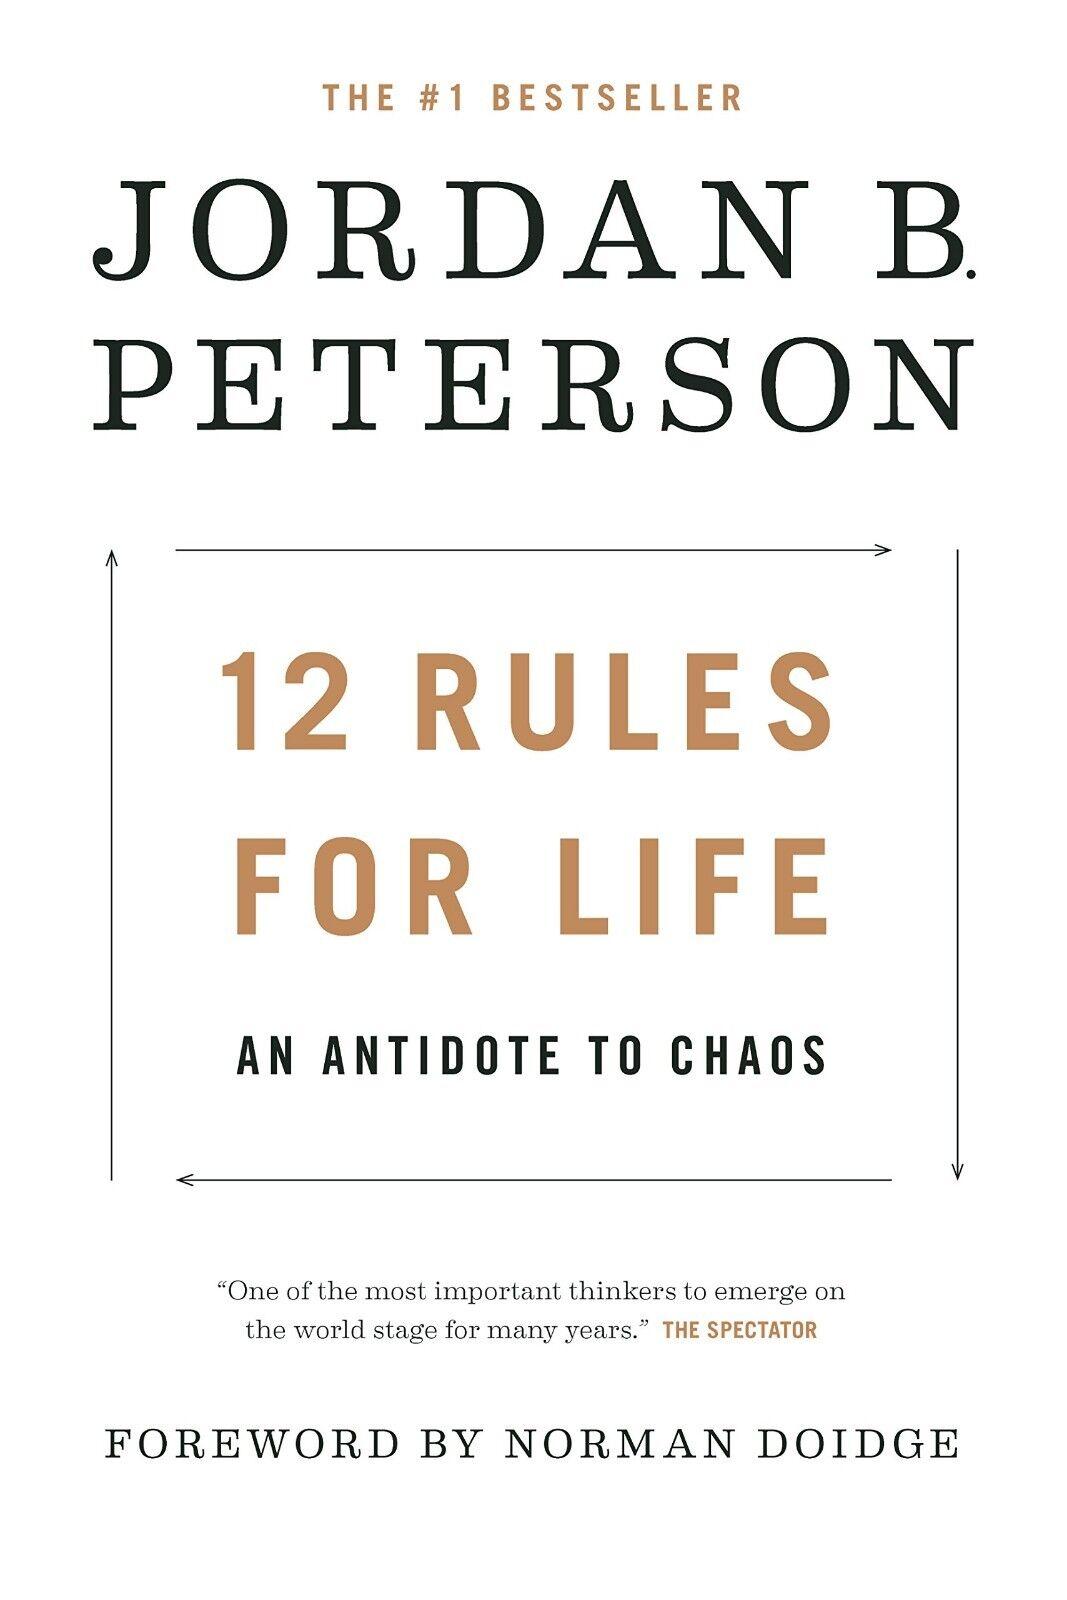 Купить 12 Rules for Life - An Antidote to Chaos by Jordan B. Peterson (PDF)